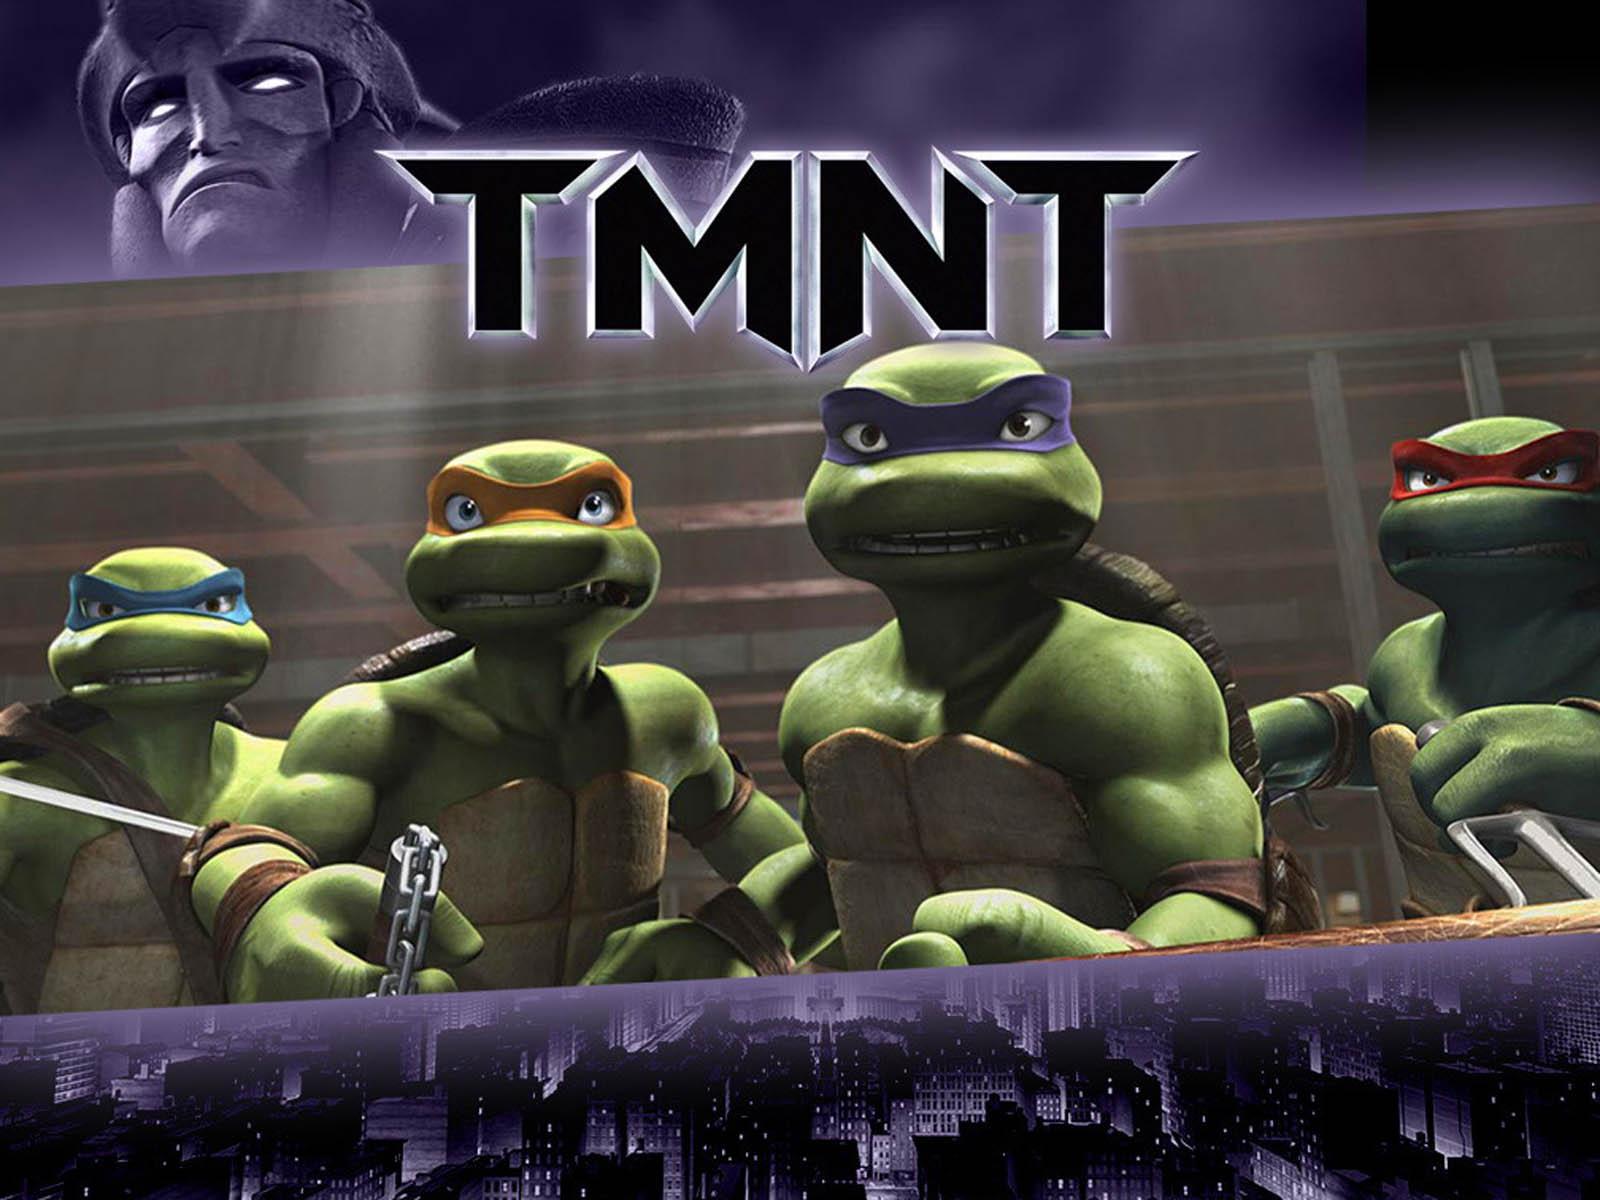 http://1.bp.blogspot.com/-u2xluguhYsg/T8cWgEE9raI/AAAAAAAADU0/l_sI_W2n5I8/s1600/Teenage+Mutant+Ninja+Turtles+(TMNT).jpg